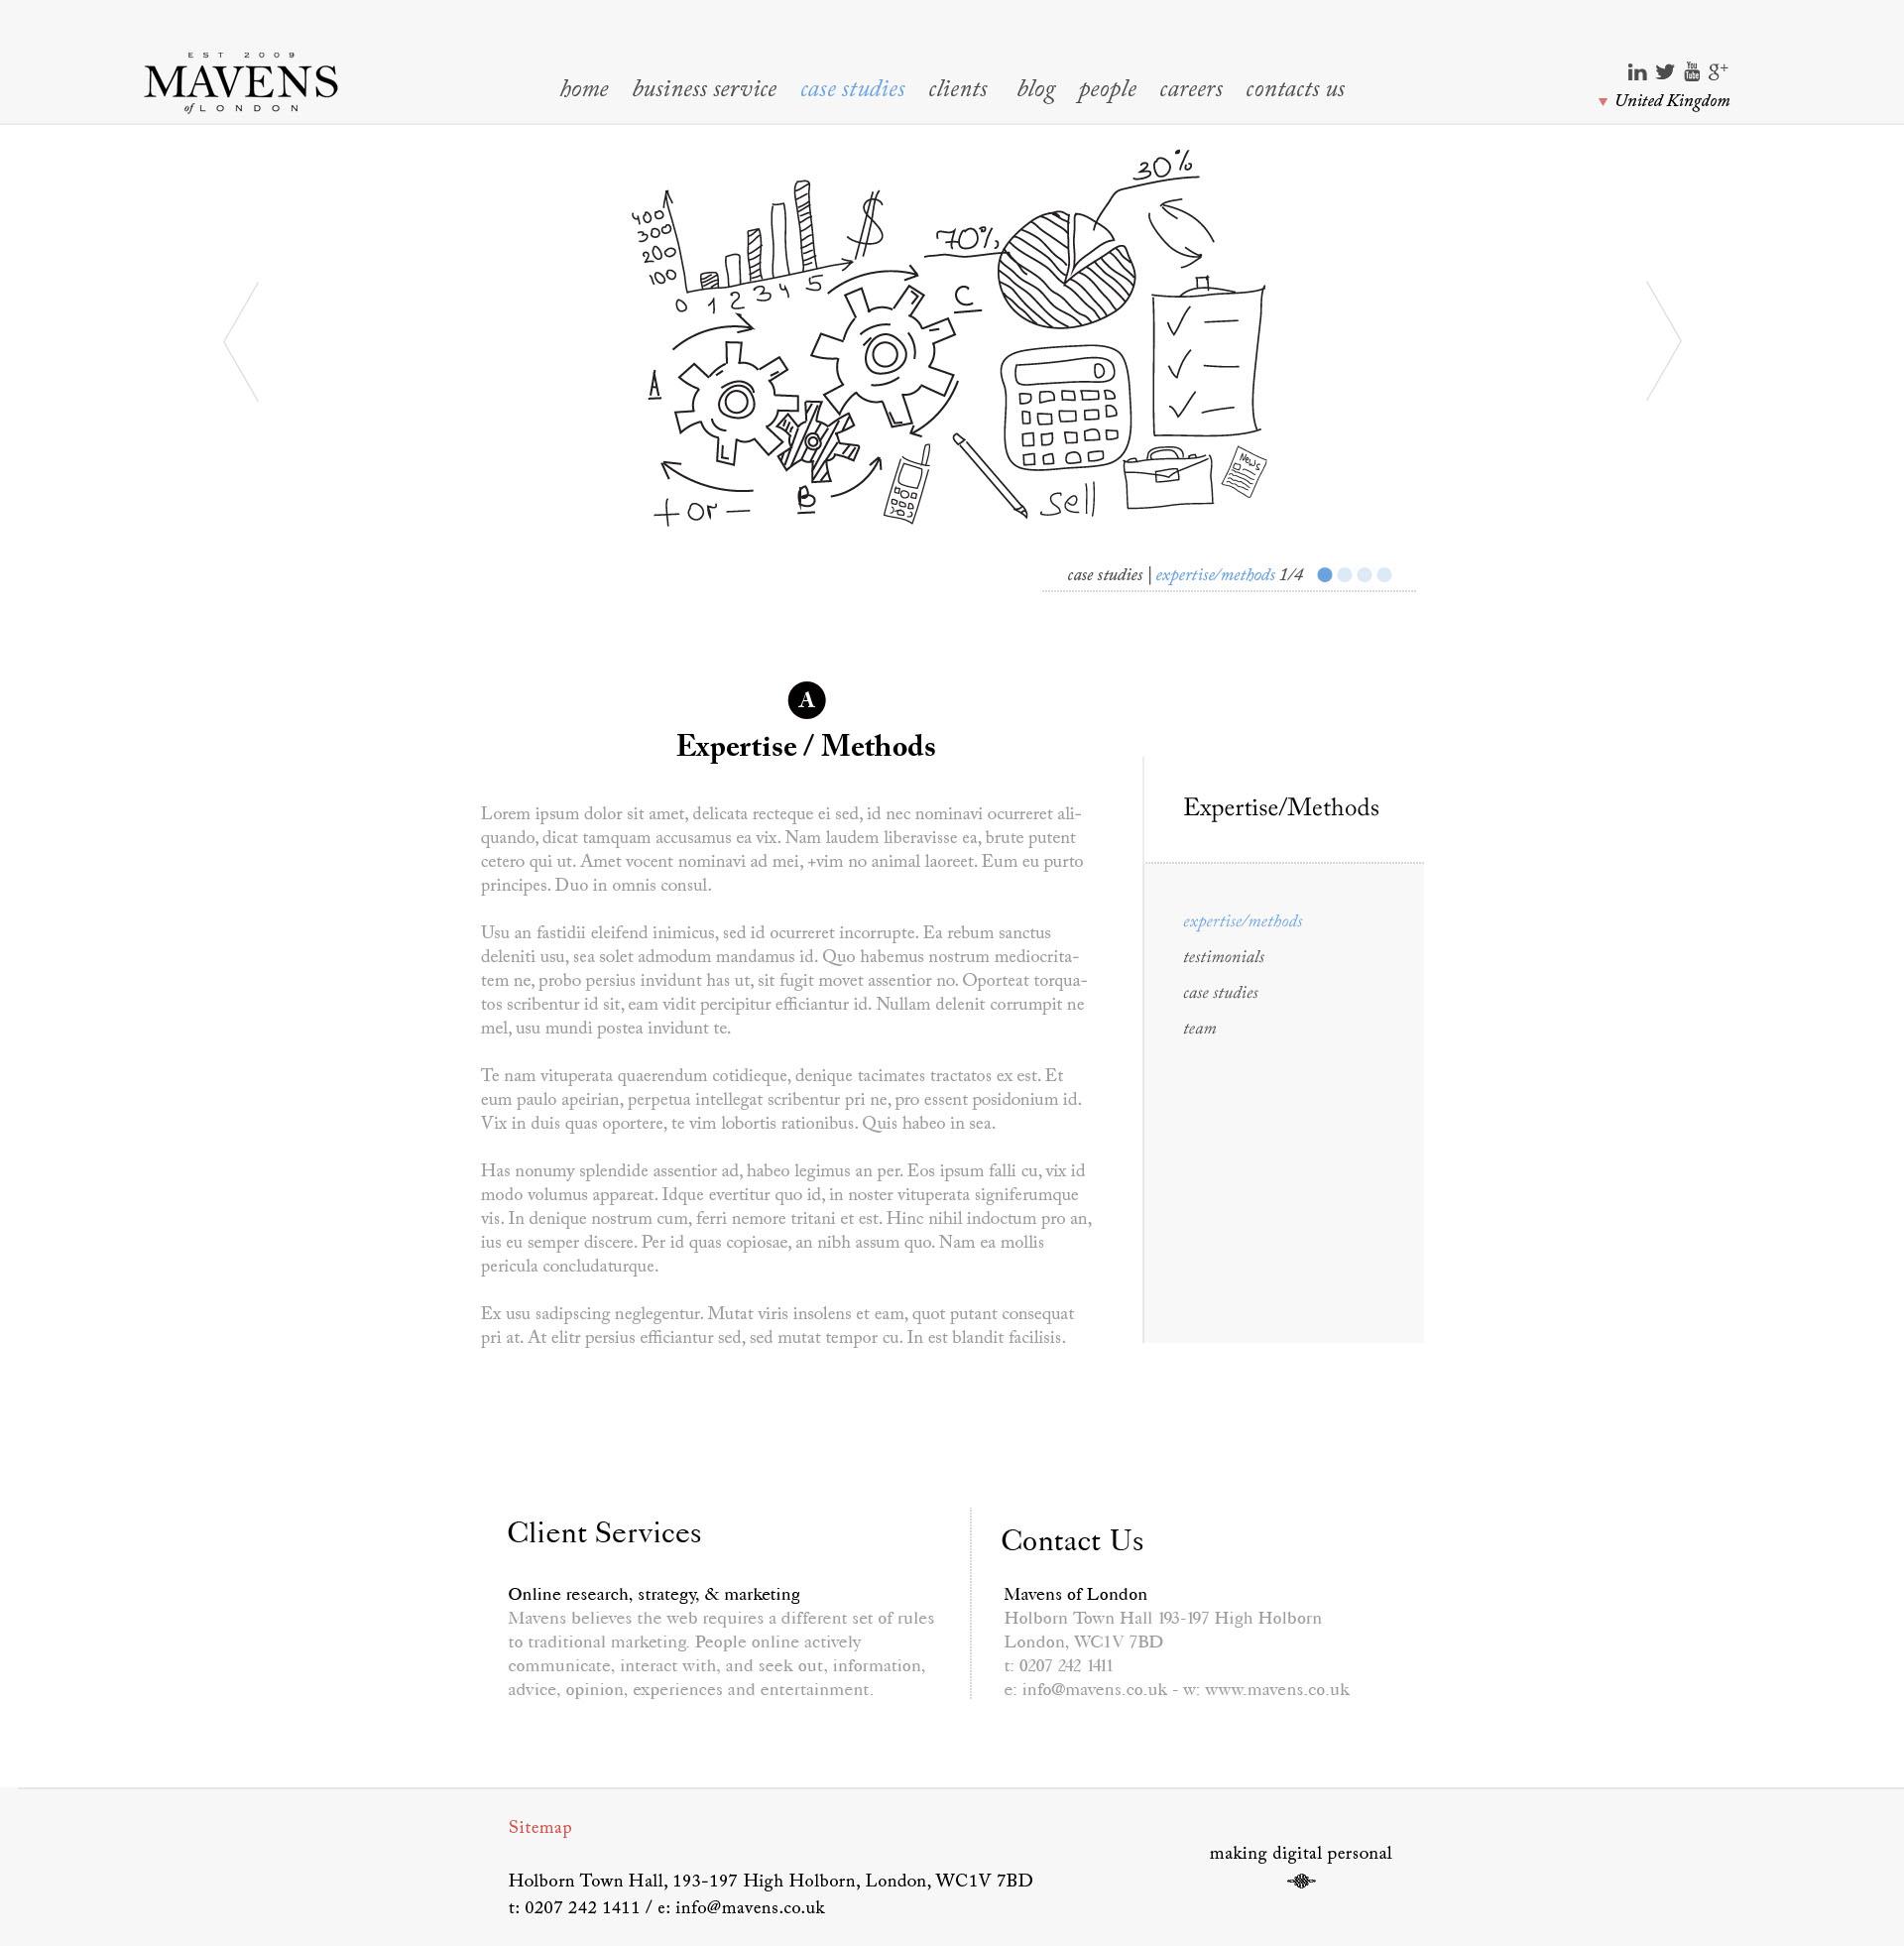 Mavens of London / Case Studies